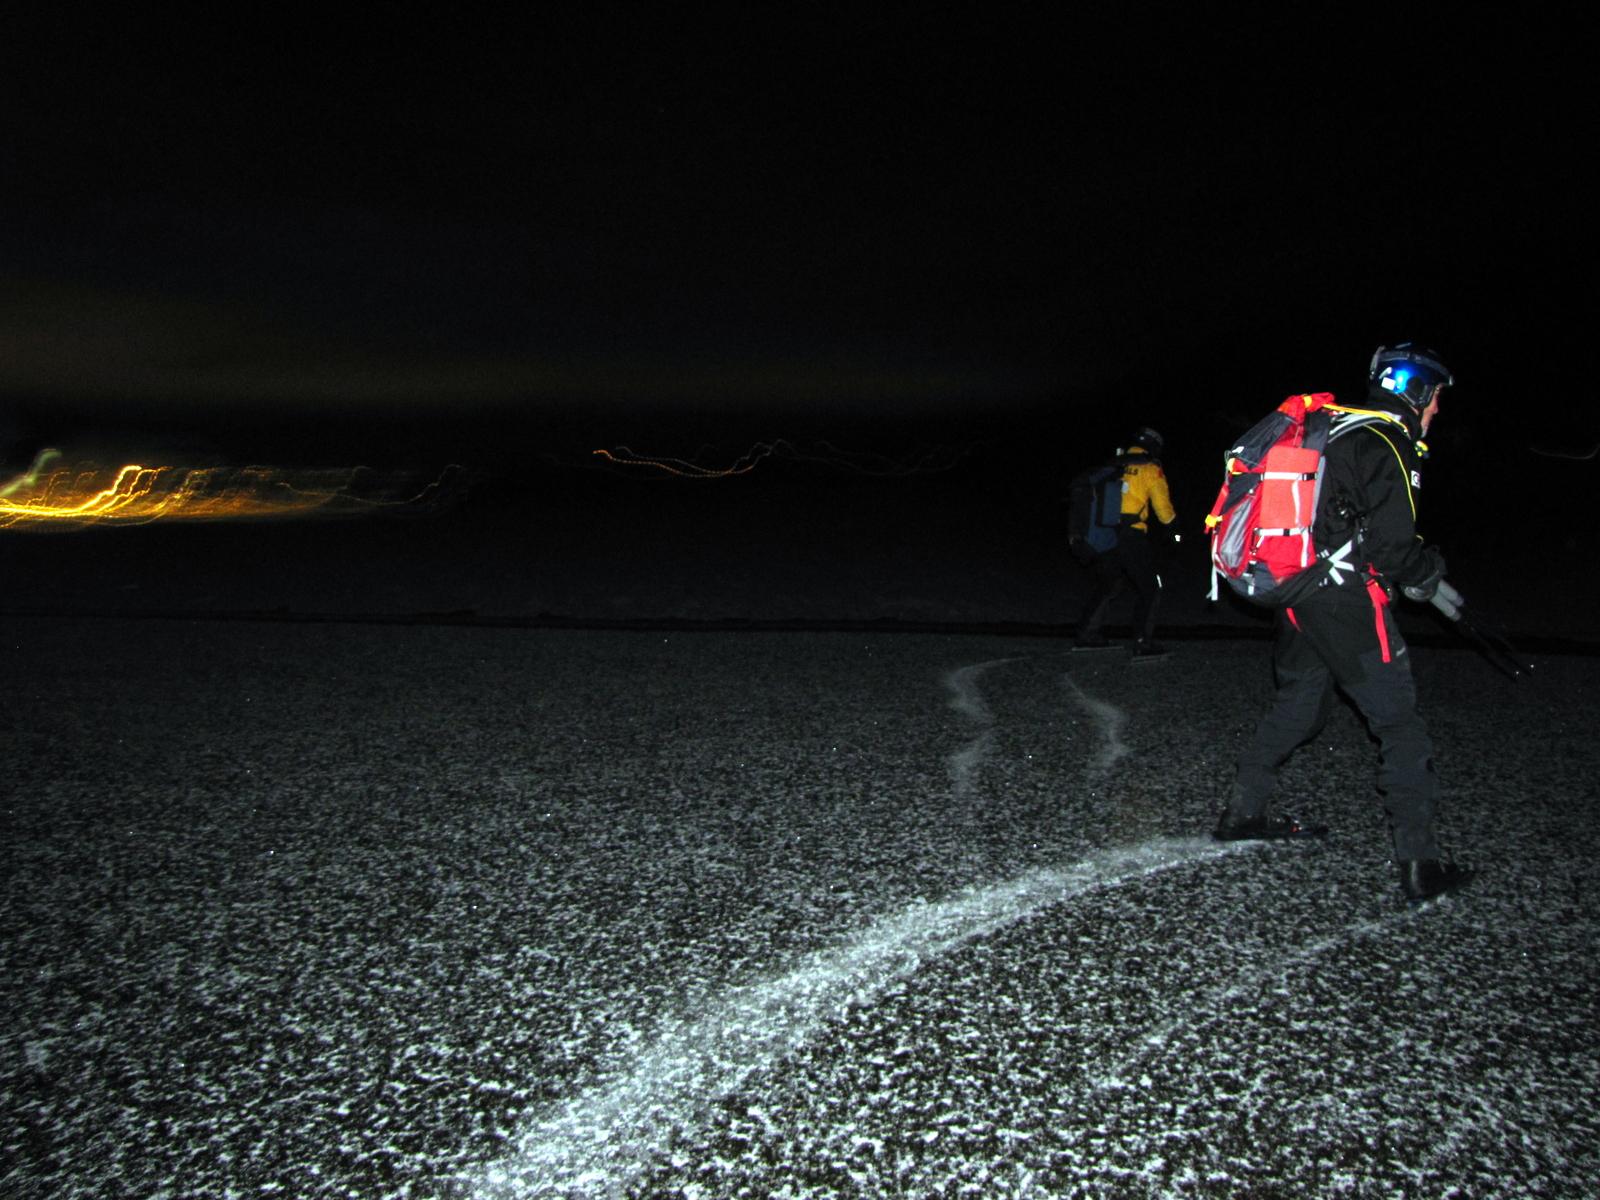 Nr: 71679 Månskenstur, foto: Jan Jacobsson